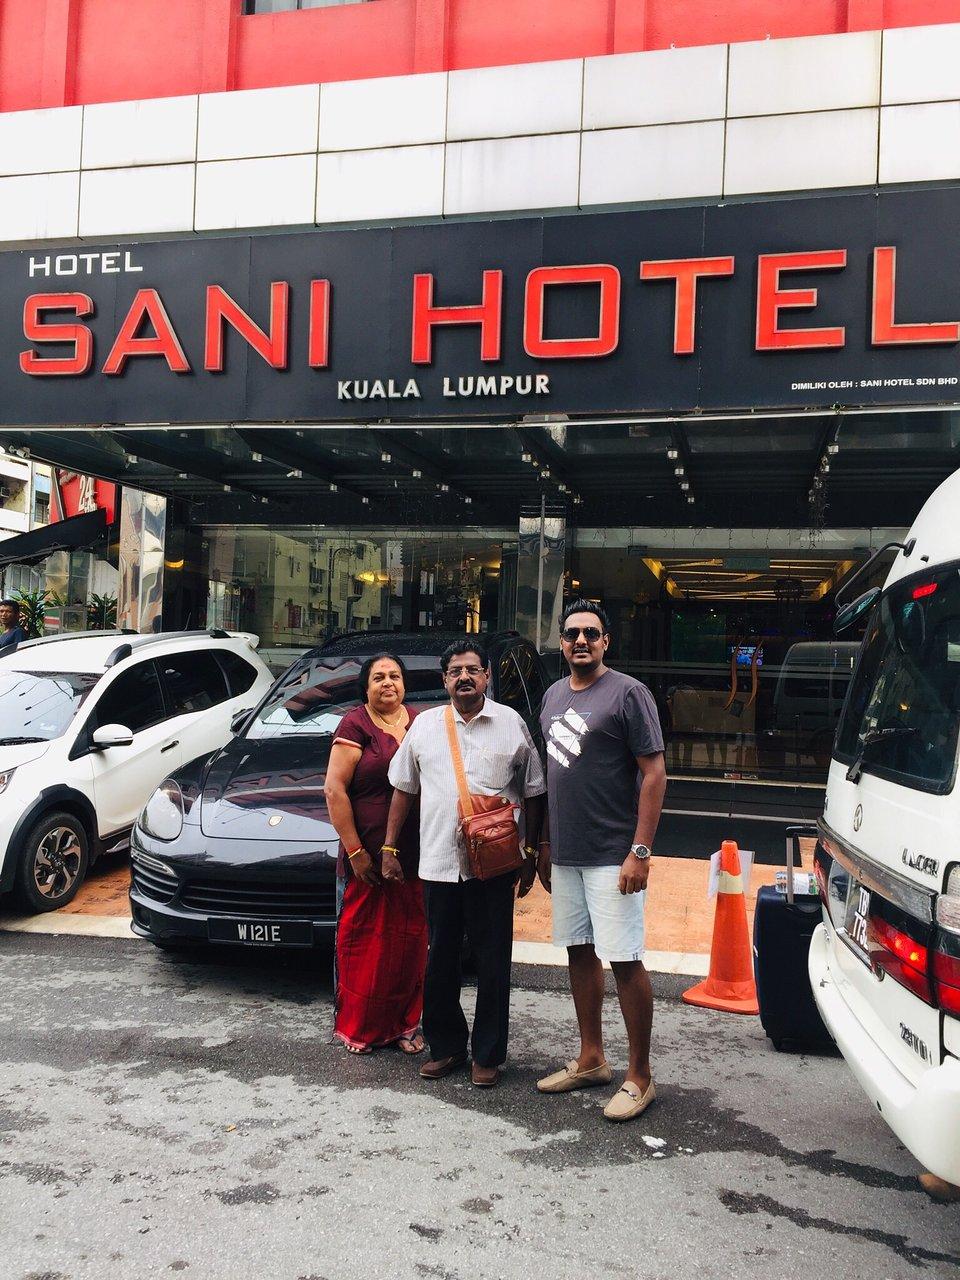 SANI HOTEL $20 ($̶3̶2̶) - Updated 2019 Prices & Reviews